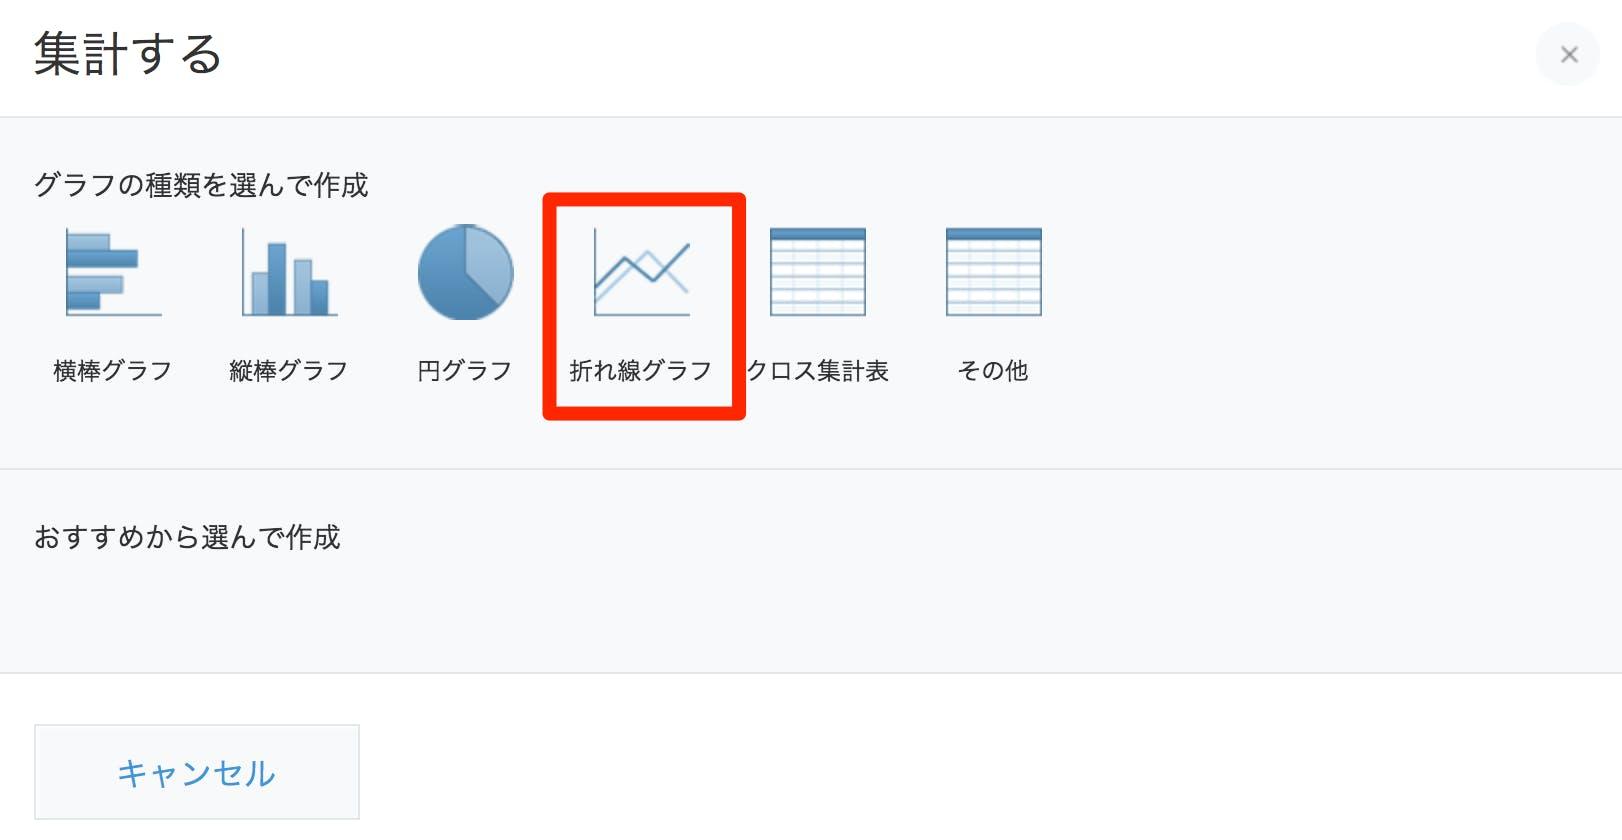 310_kintone_温度表示_-_レコードの一覧.png